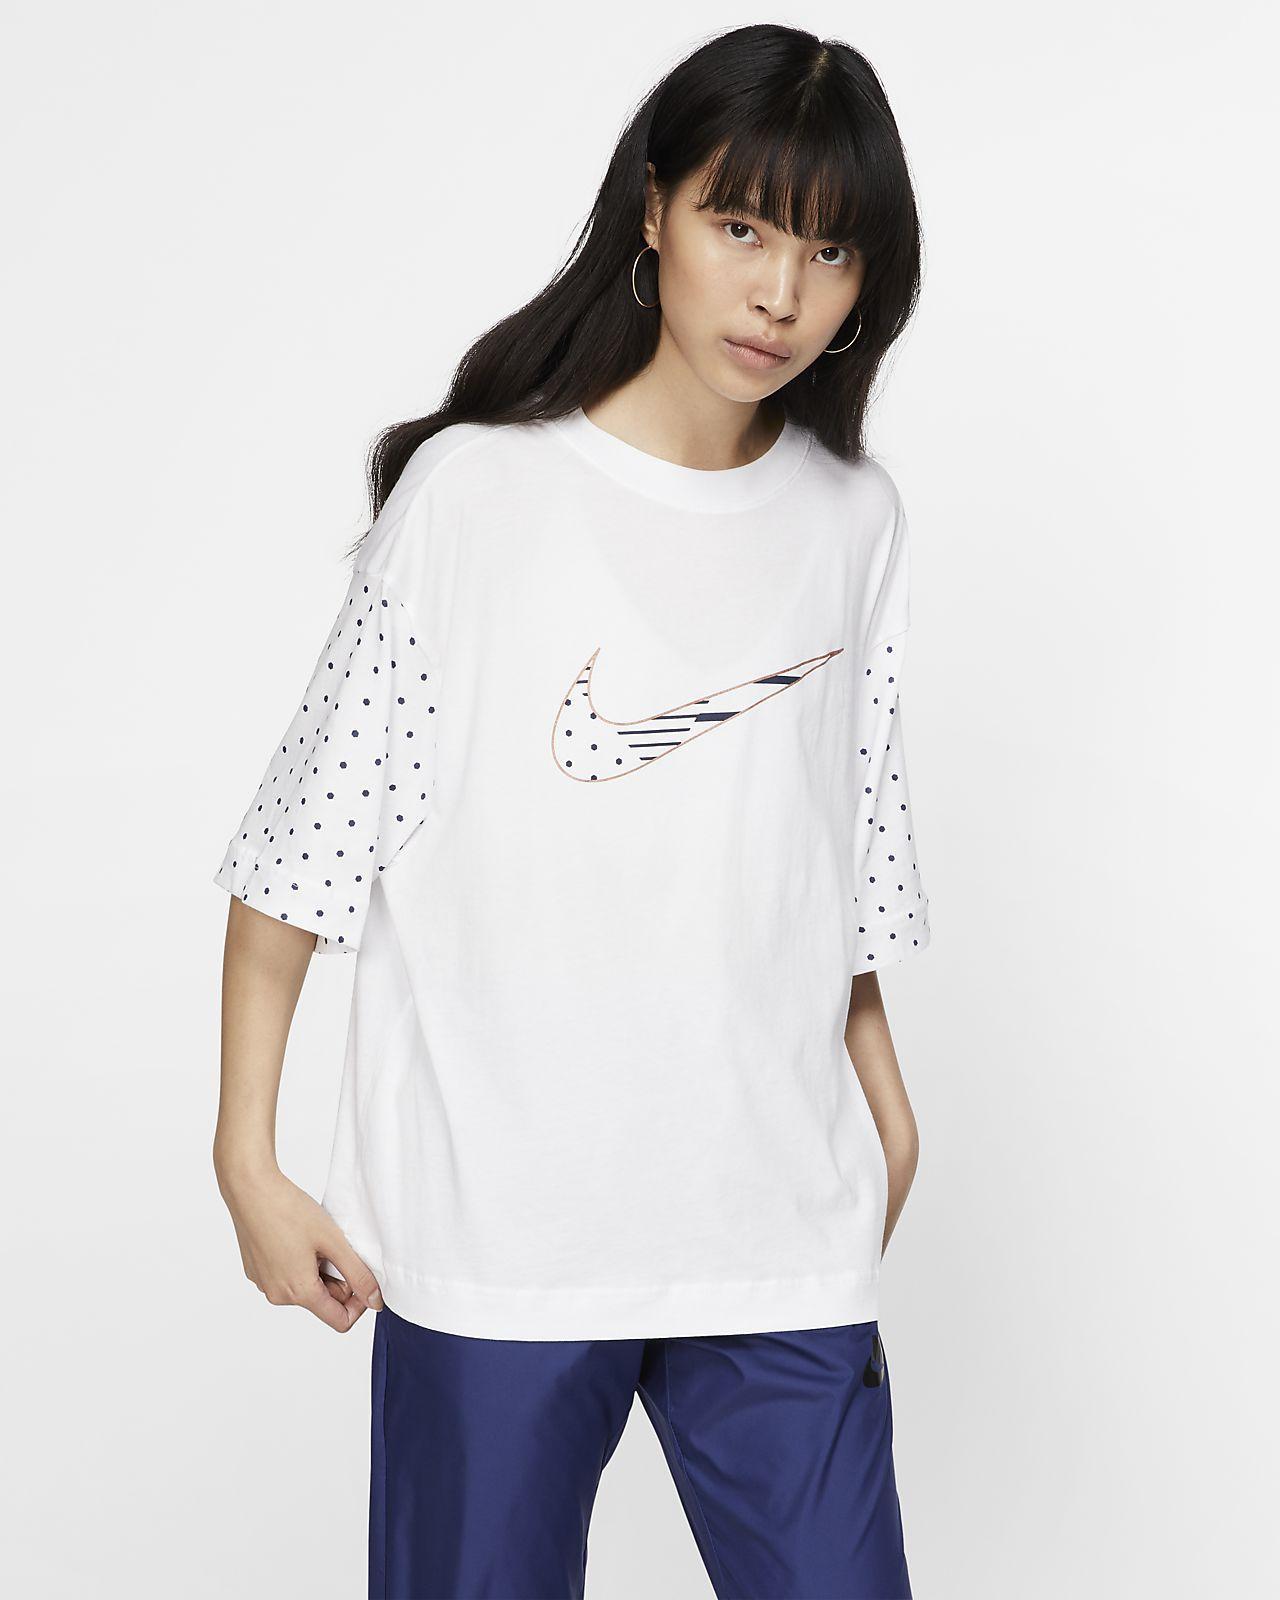 Nike Sportswear Unité Totale Kurzarm-Oberteil für Damen